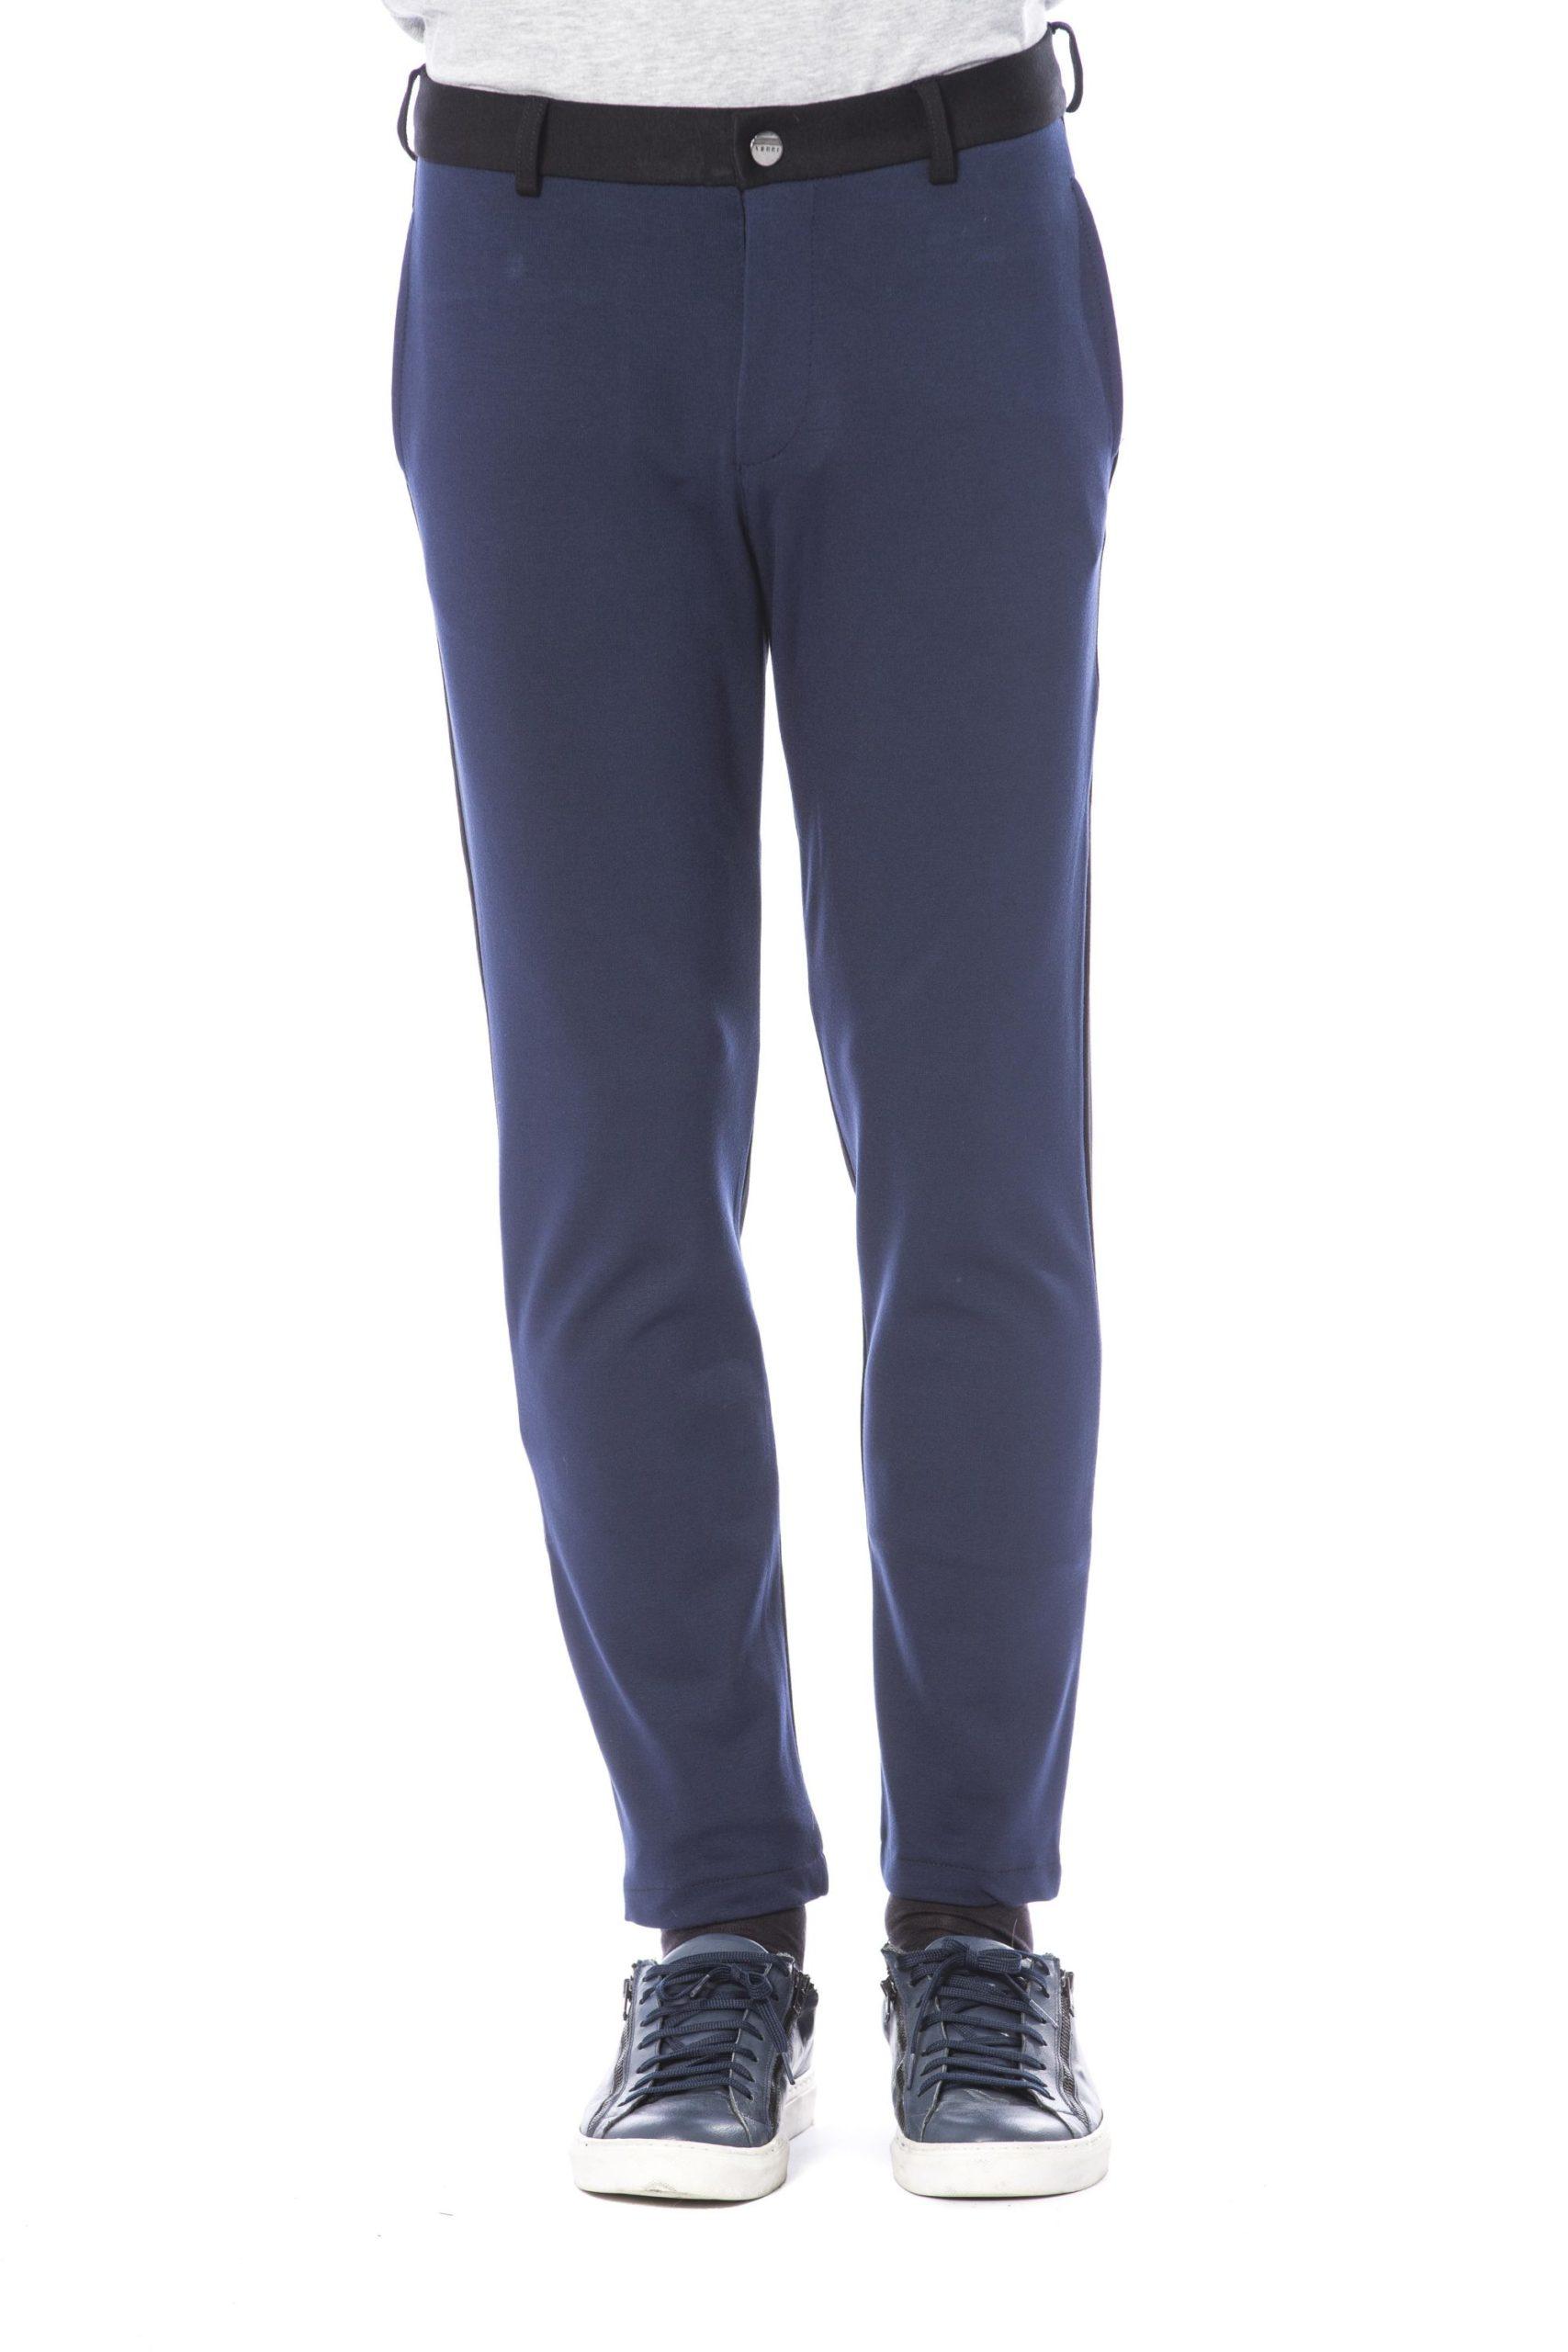 Verri Men's Trouser Blue VE1394862 - XL